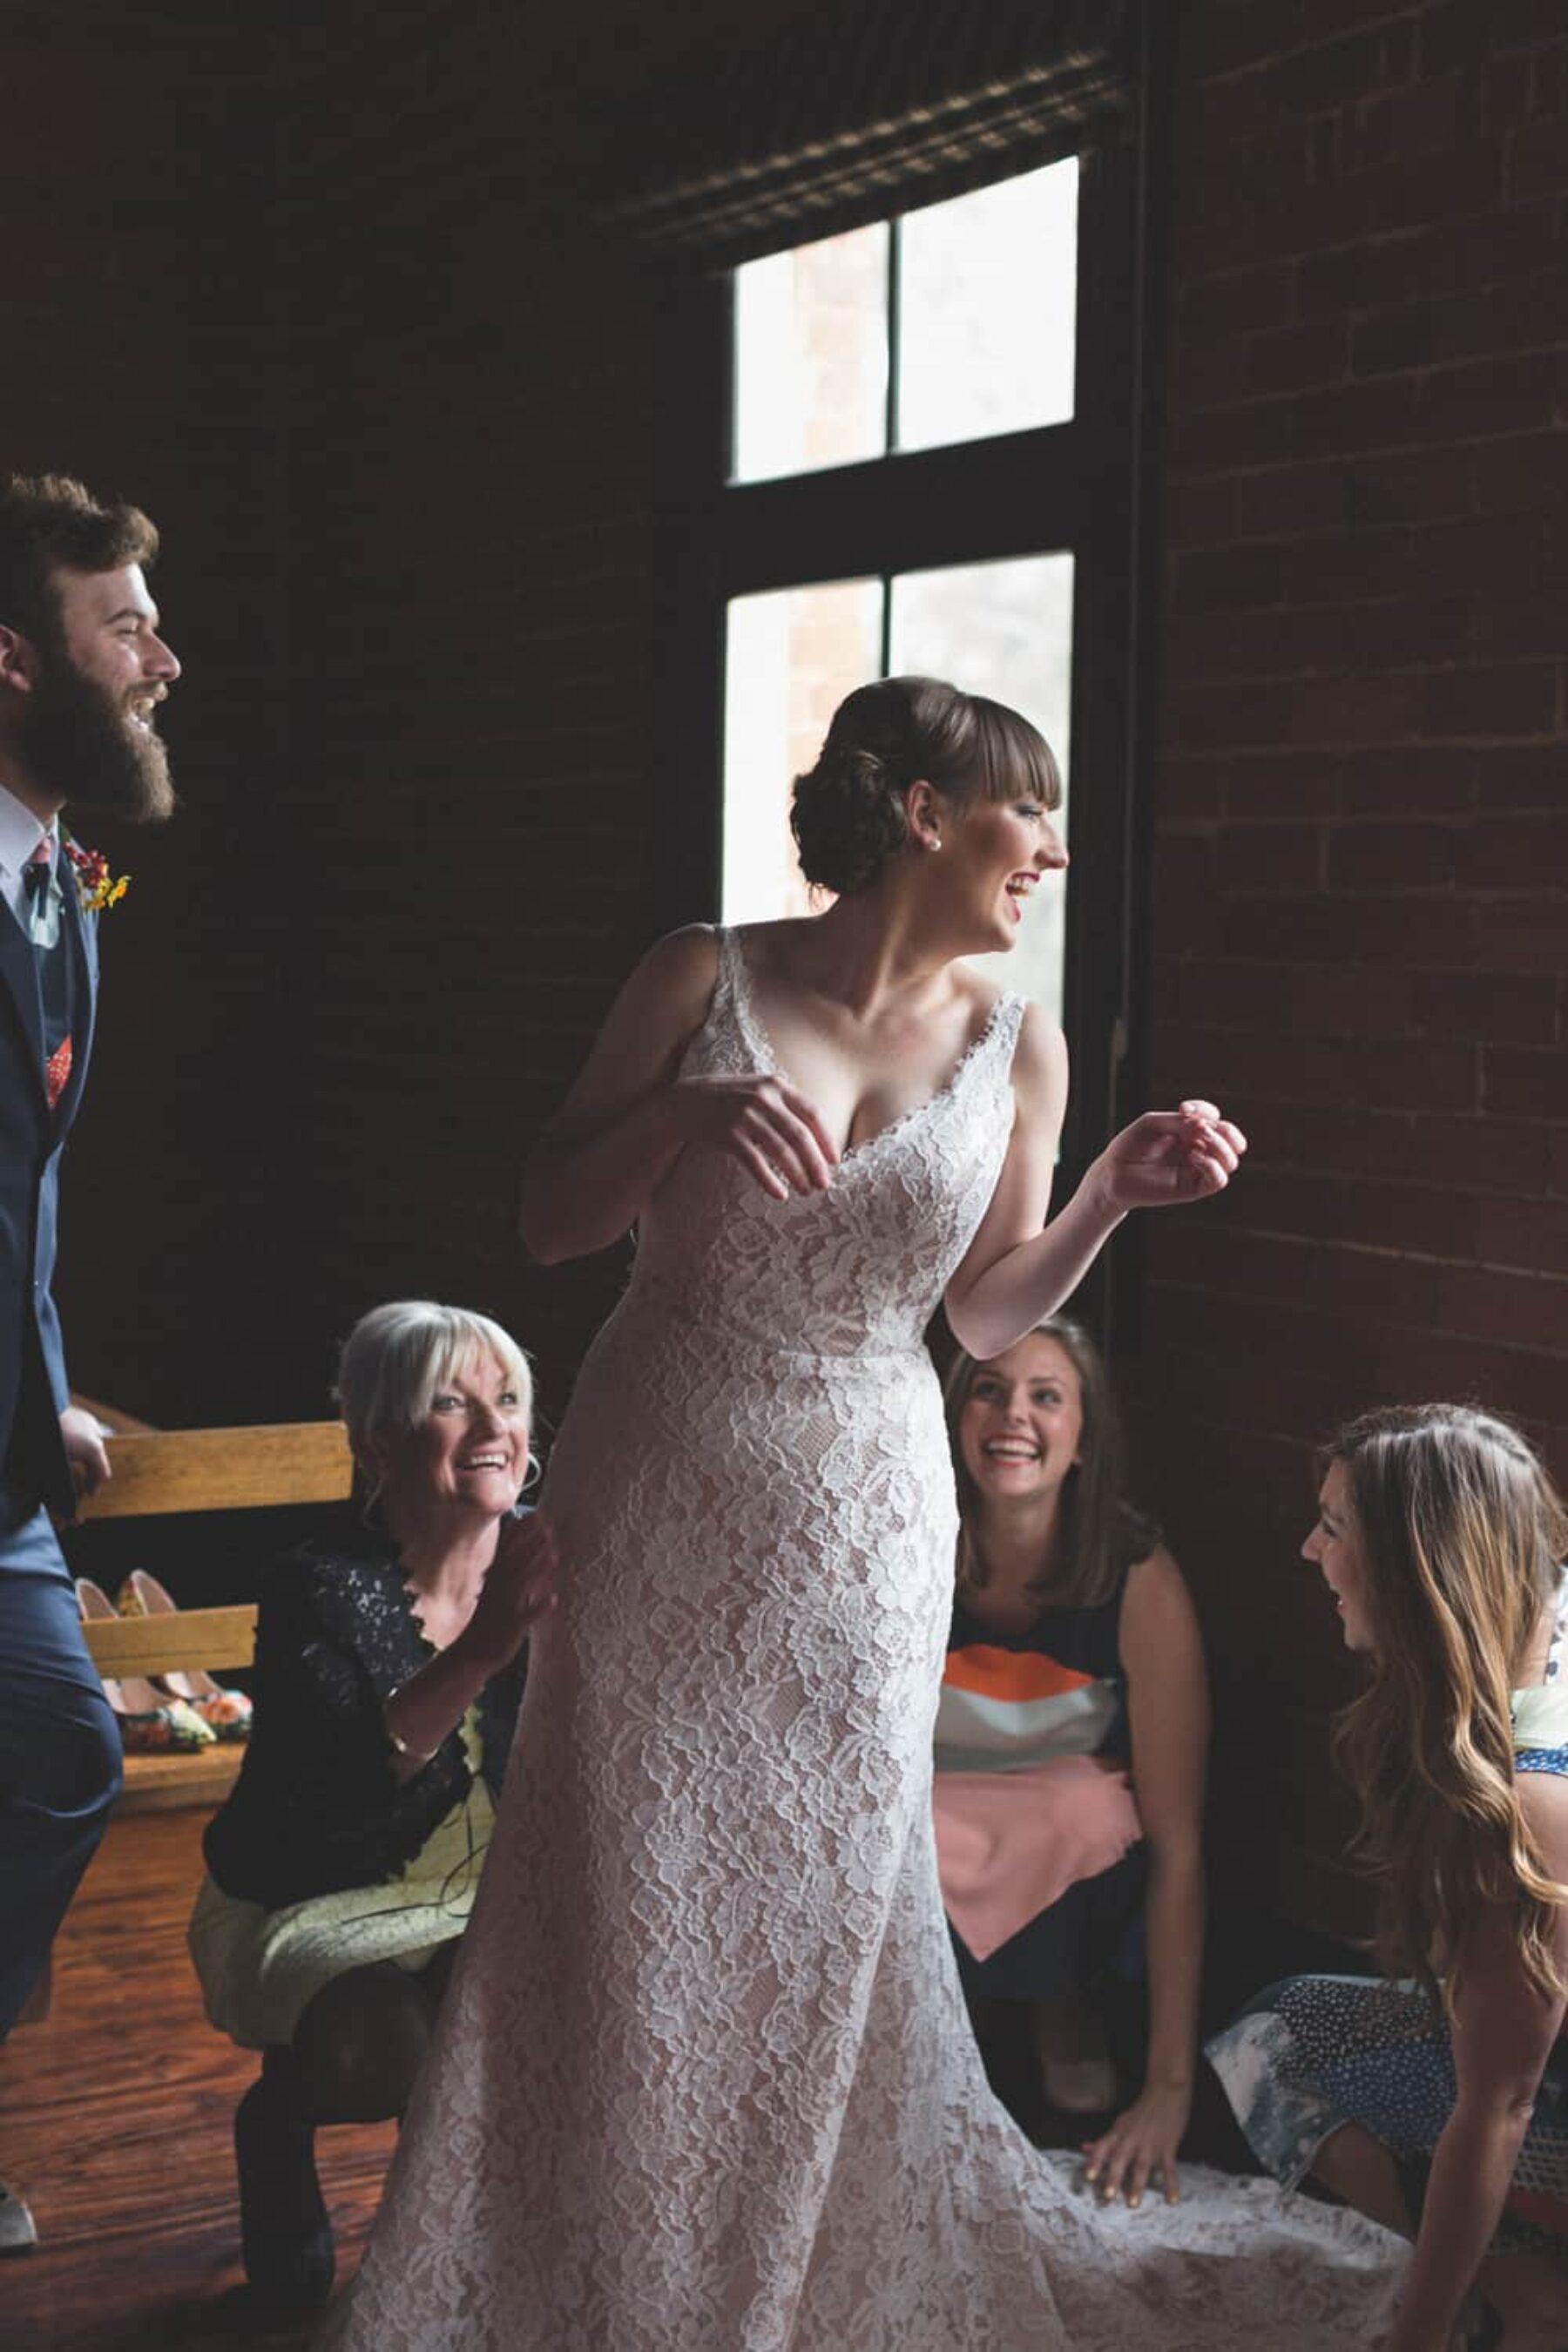 Hera Couture wedding dress